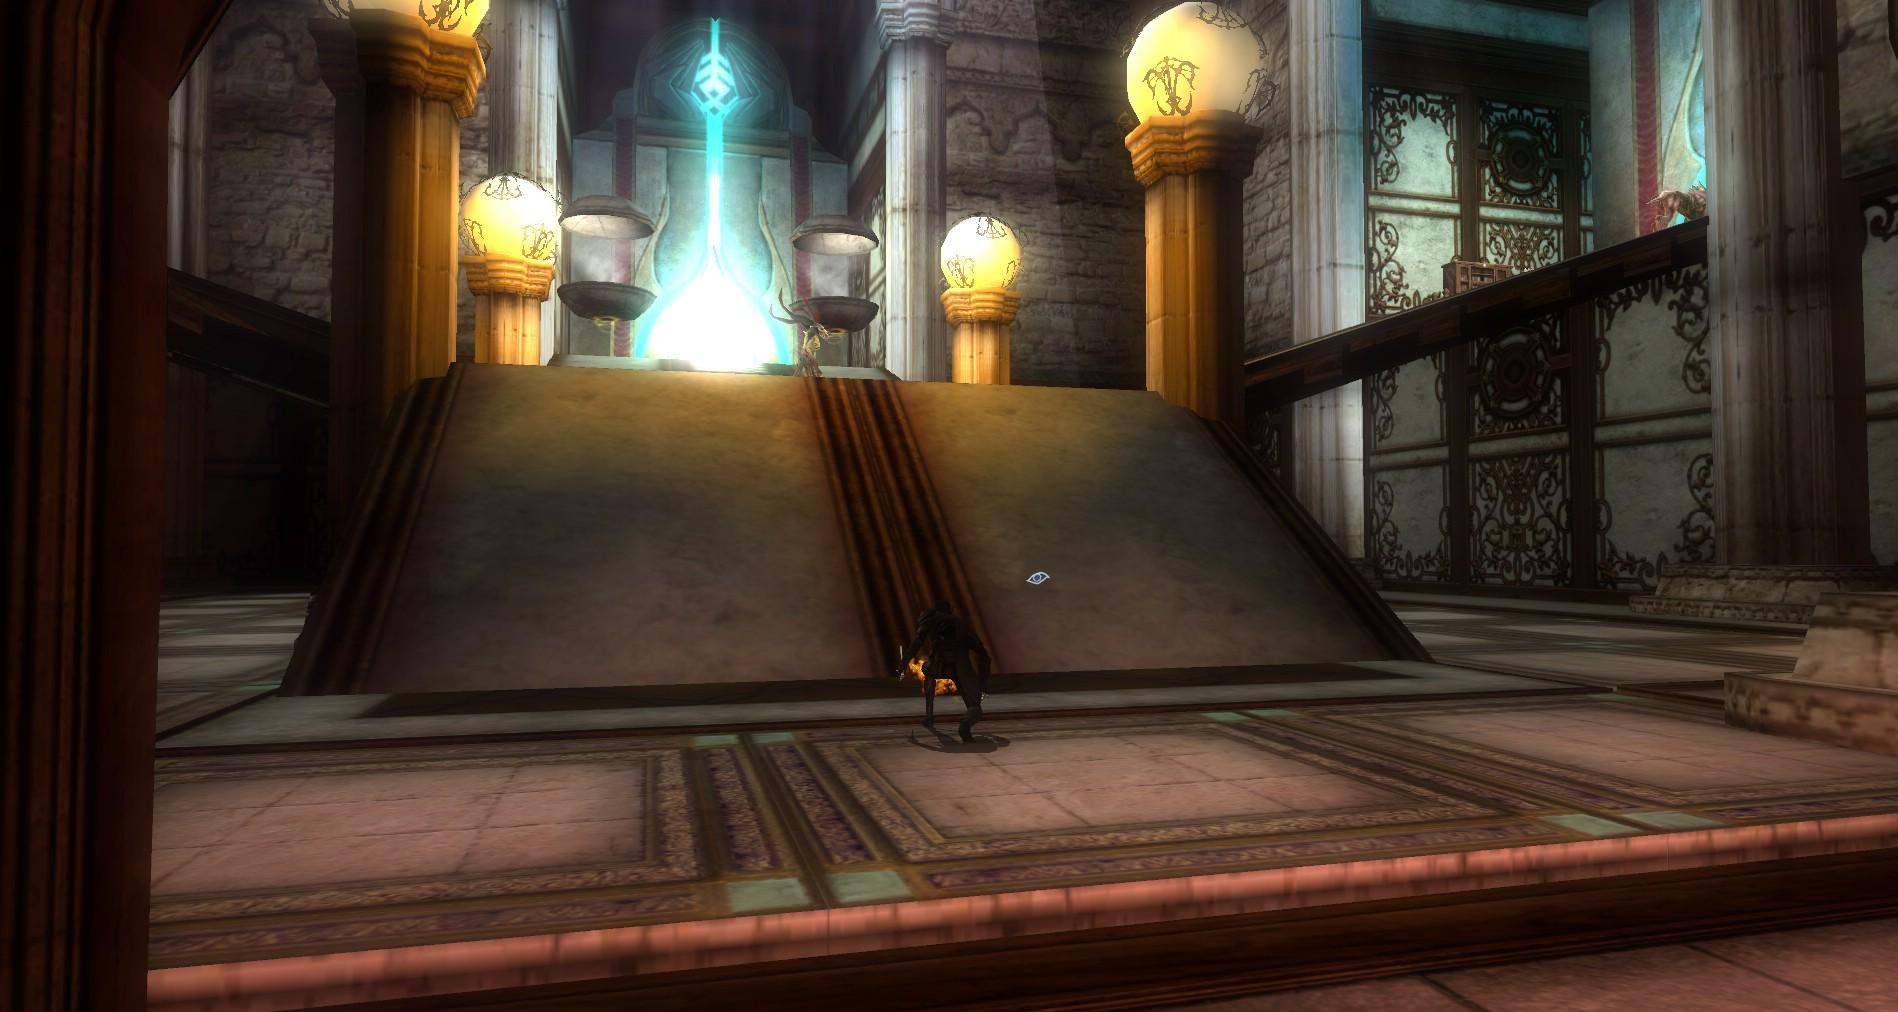 u10-lord-of-eyes-portal-room